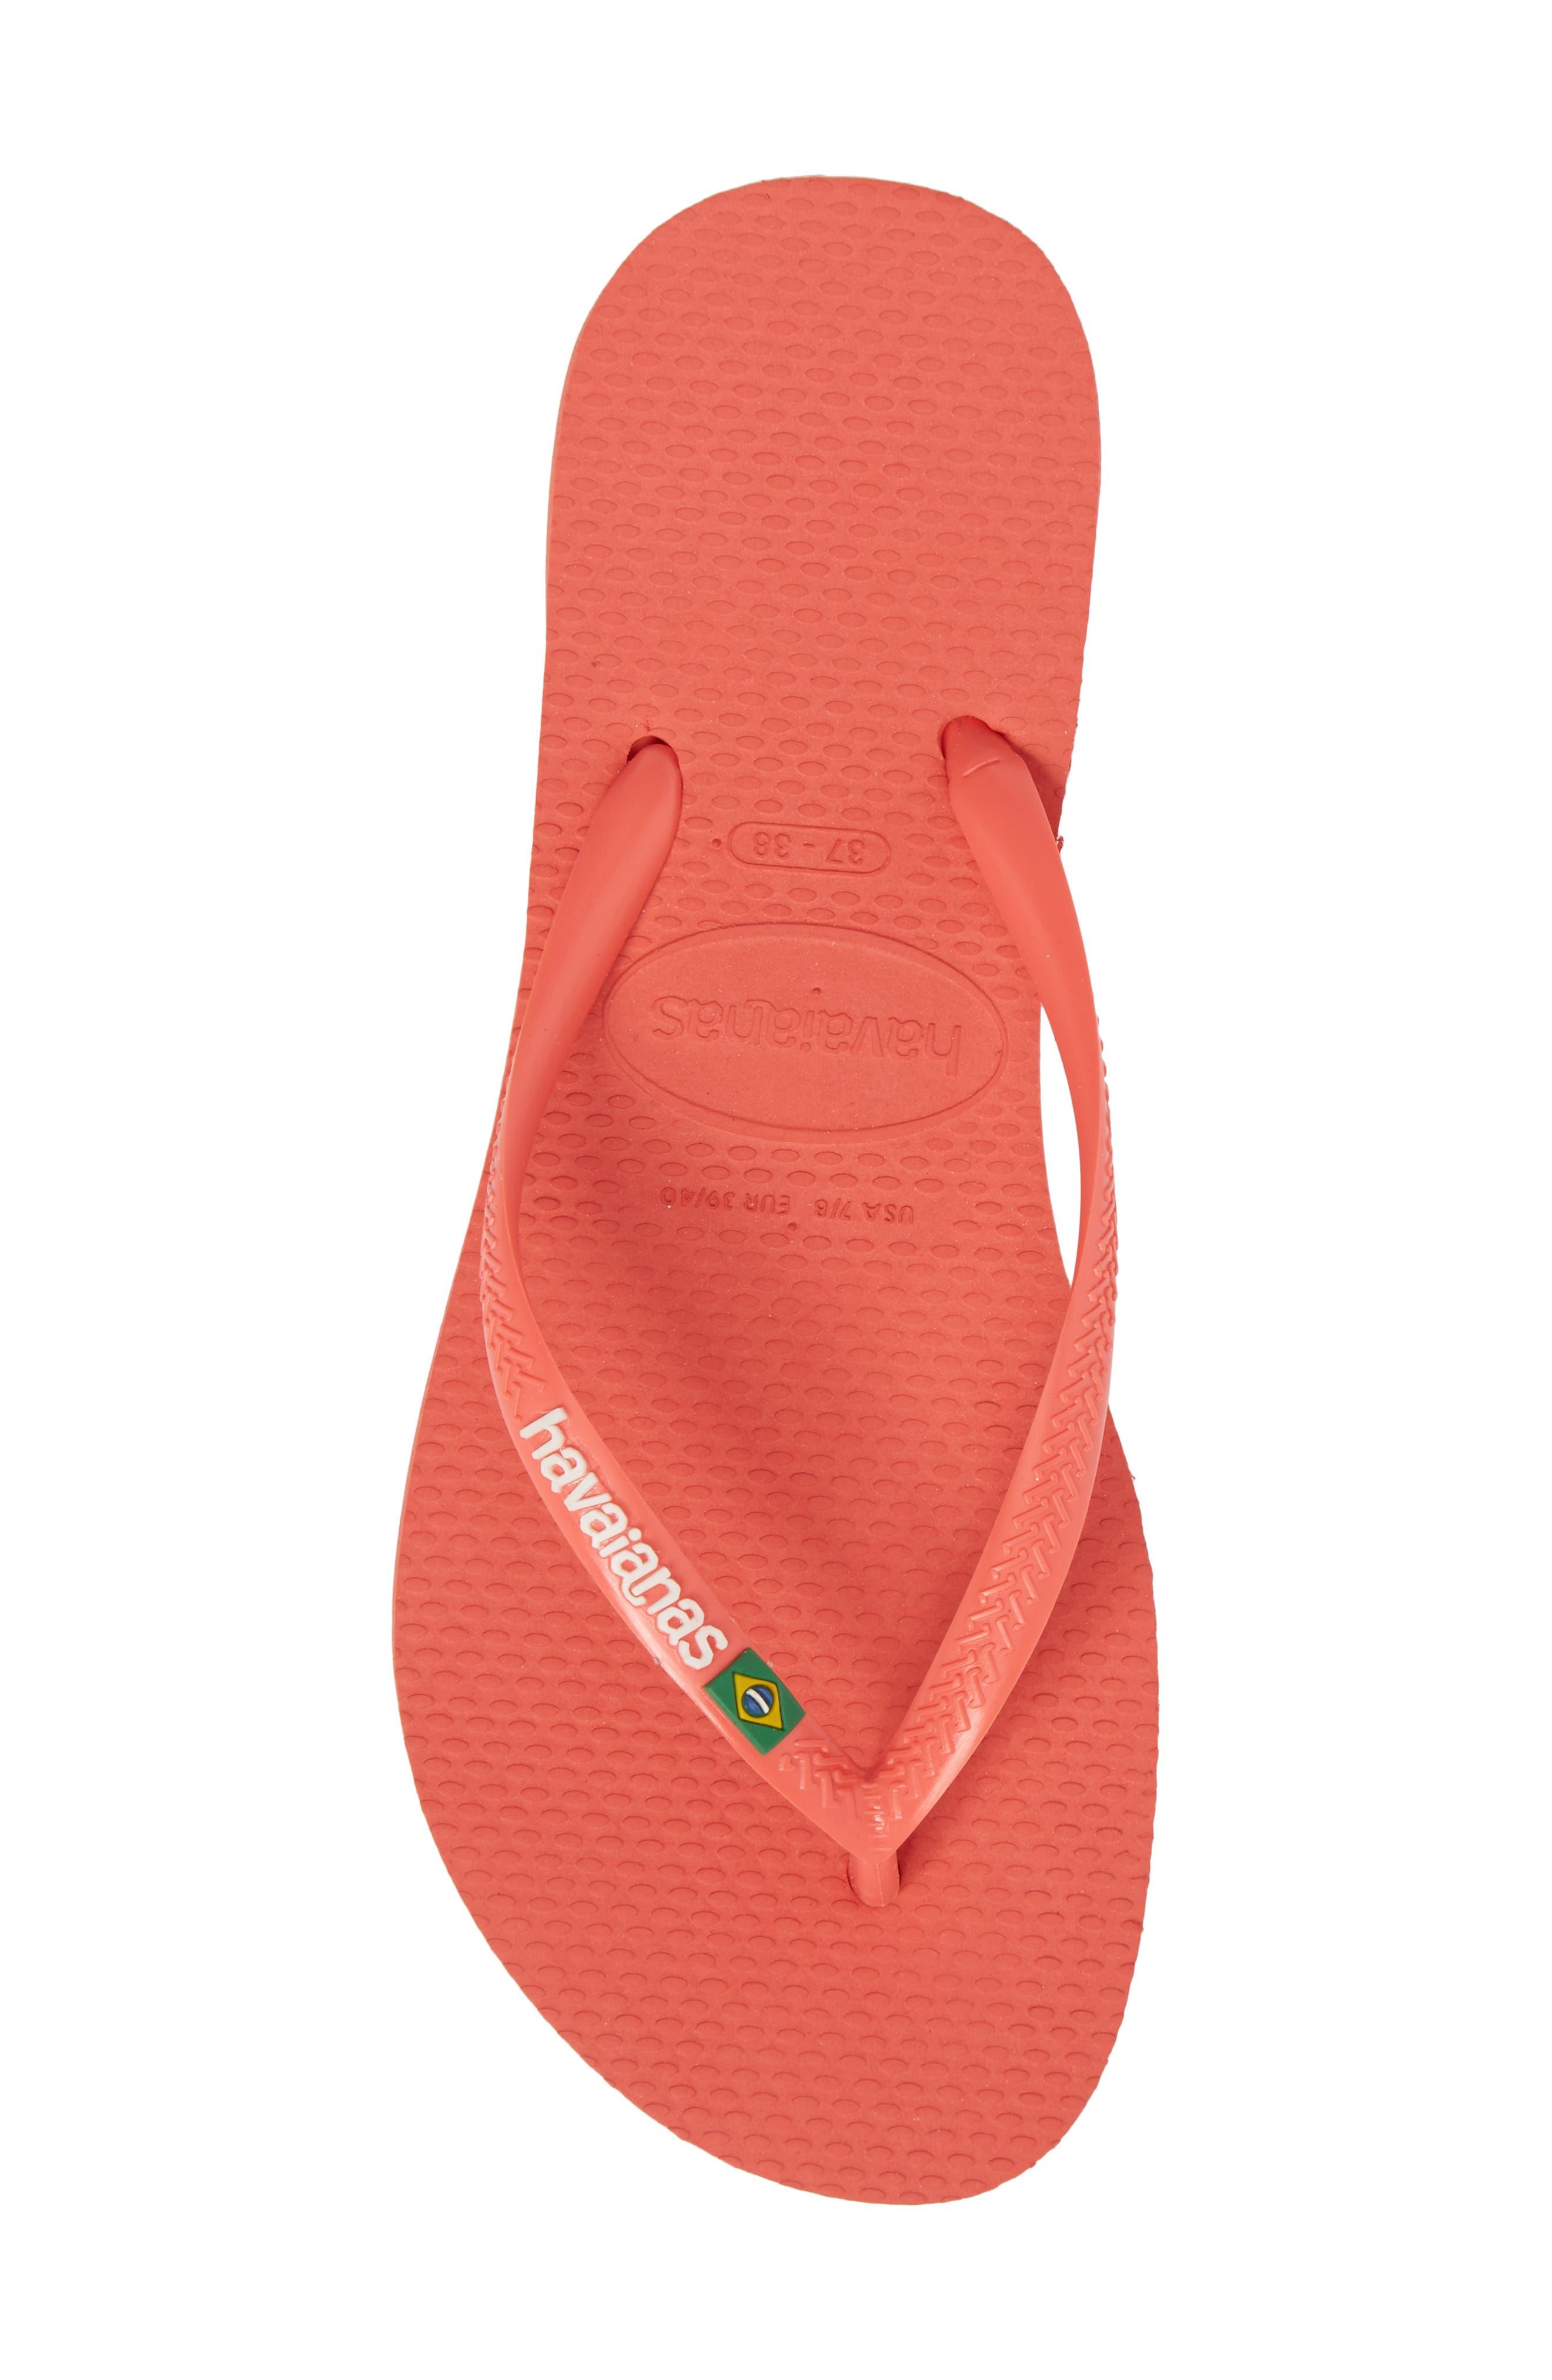 Havianas Slim Brazil Flip Flop,                             Alternate thumbnail 3, color,                             Coral